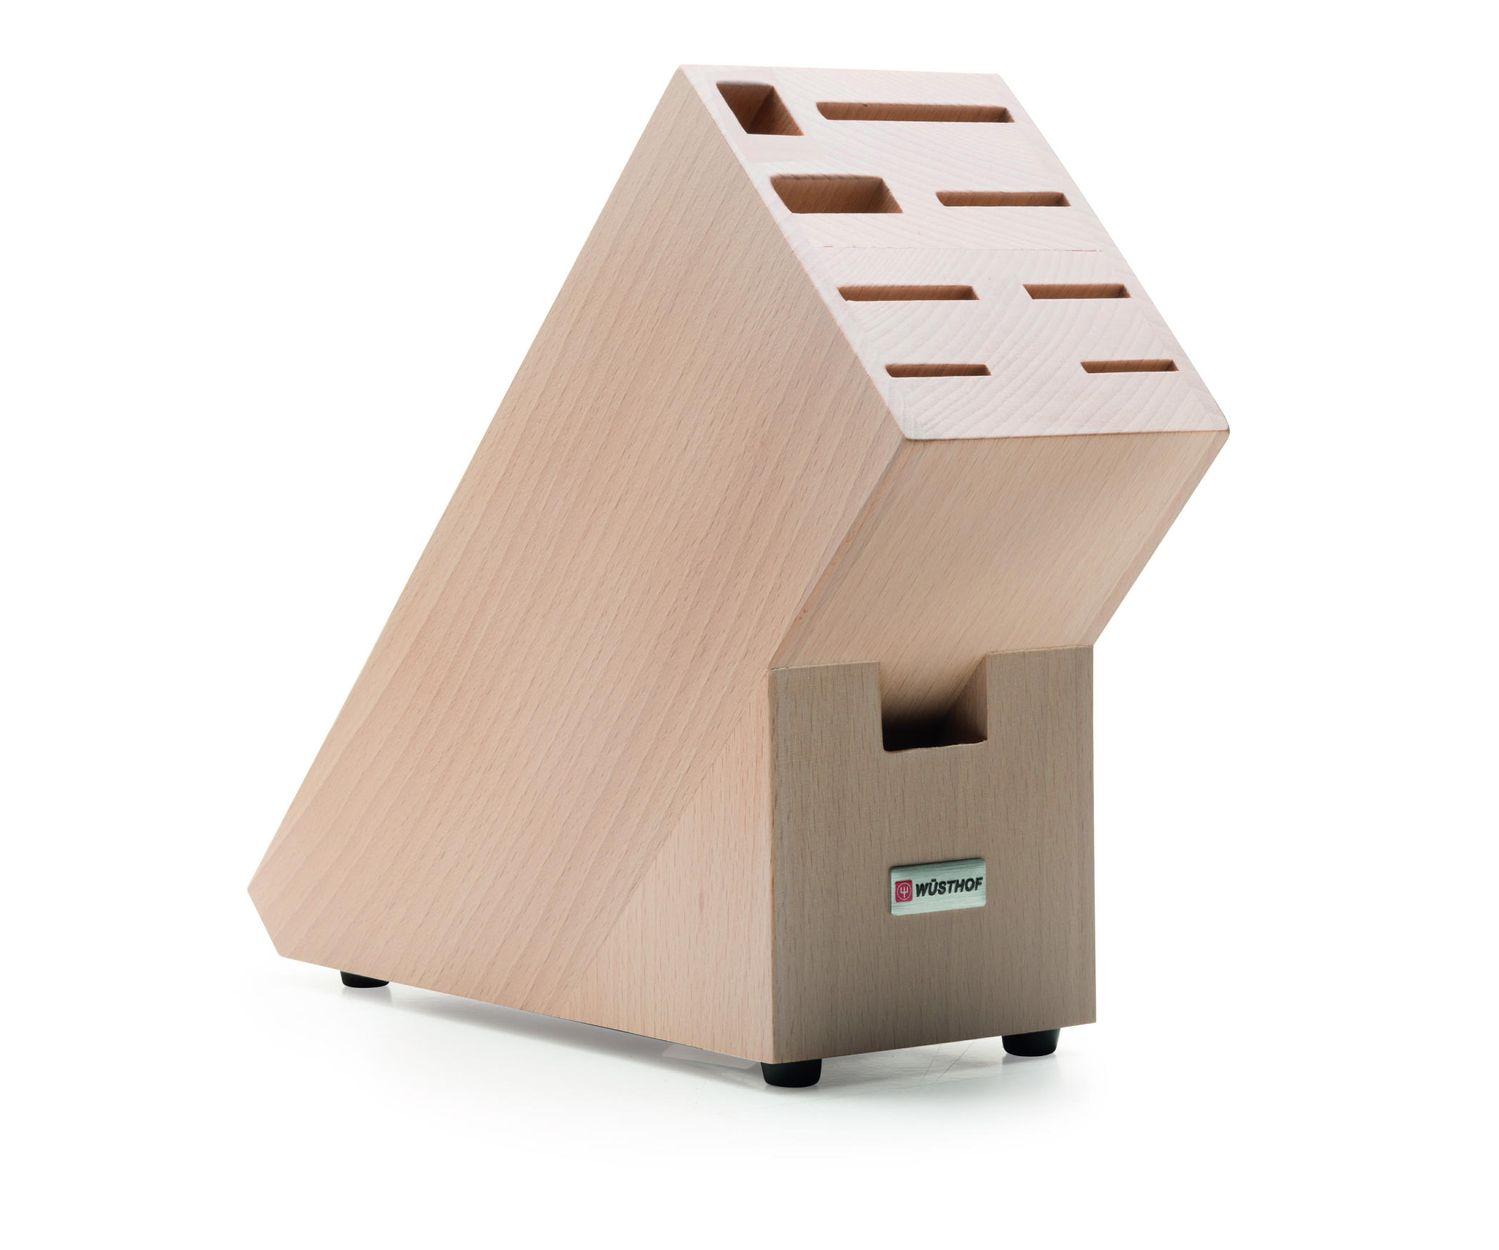 w sthof messerblock natur hier w sthof messerblock natur. Black Bedroom Furniture Sets. Home Design Ideas